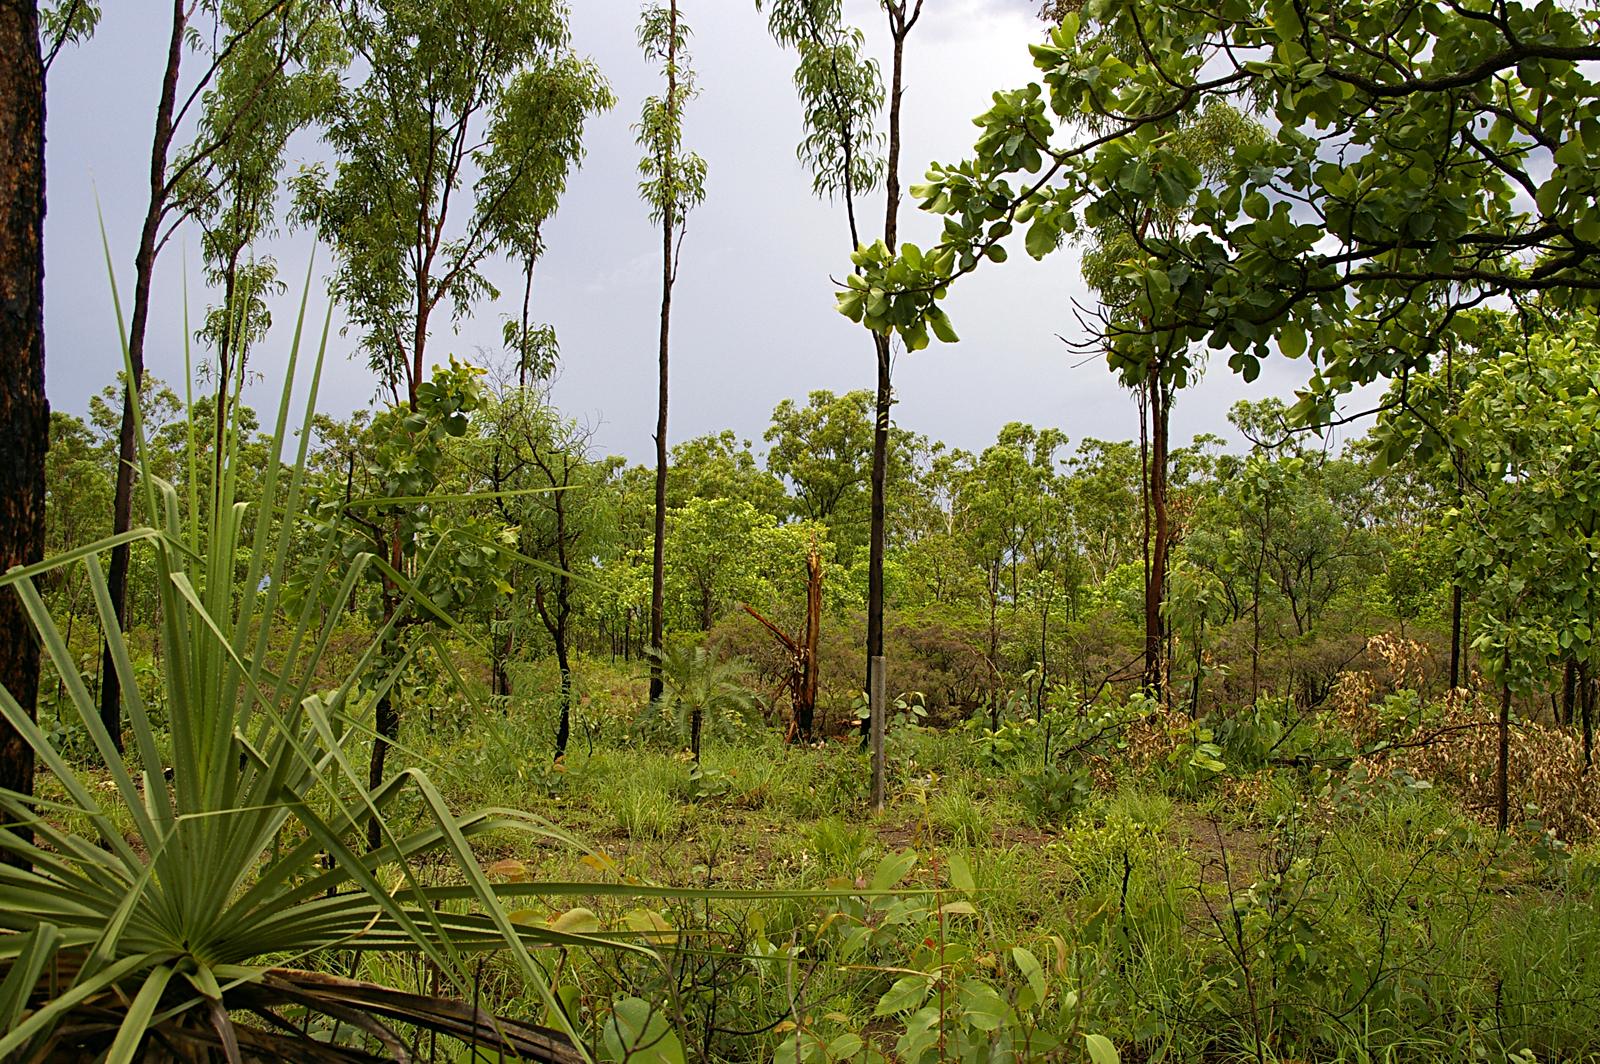 le foreste ancestrali